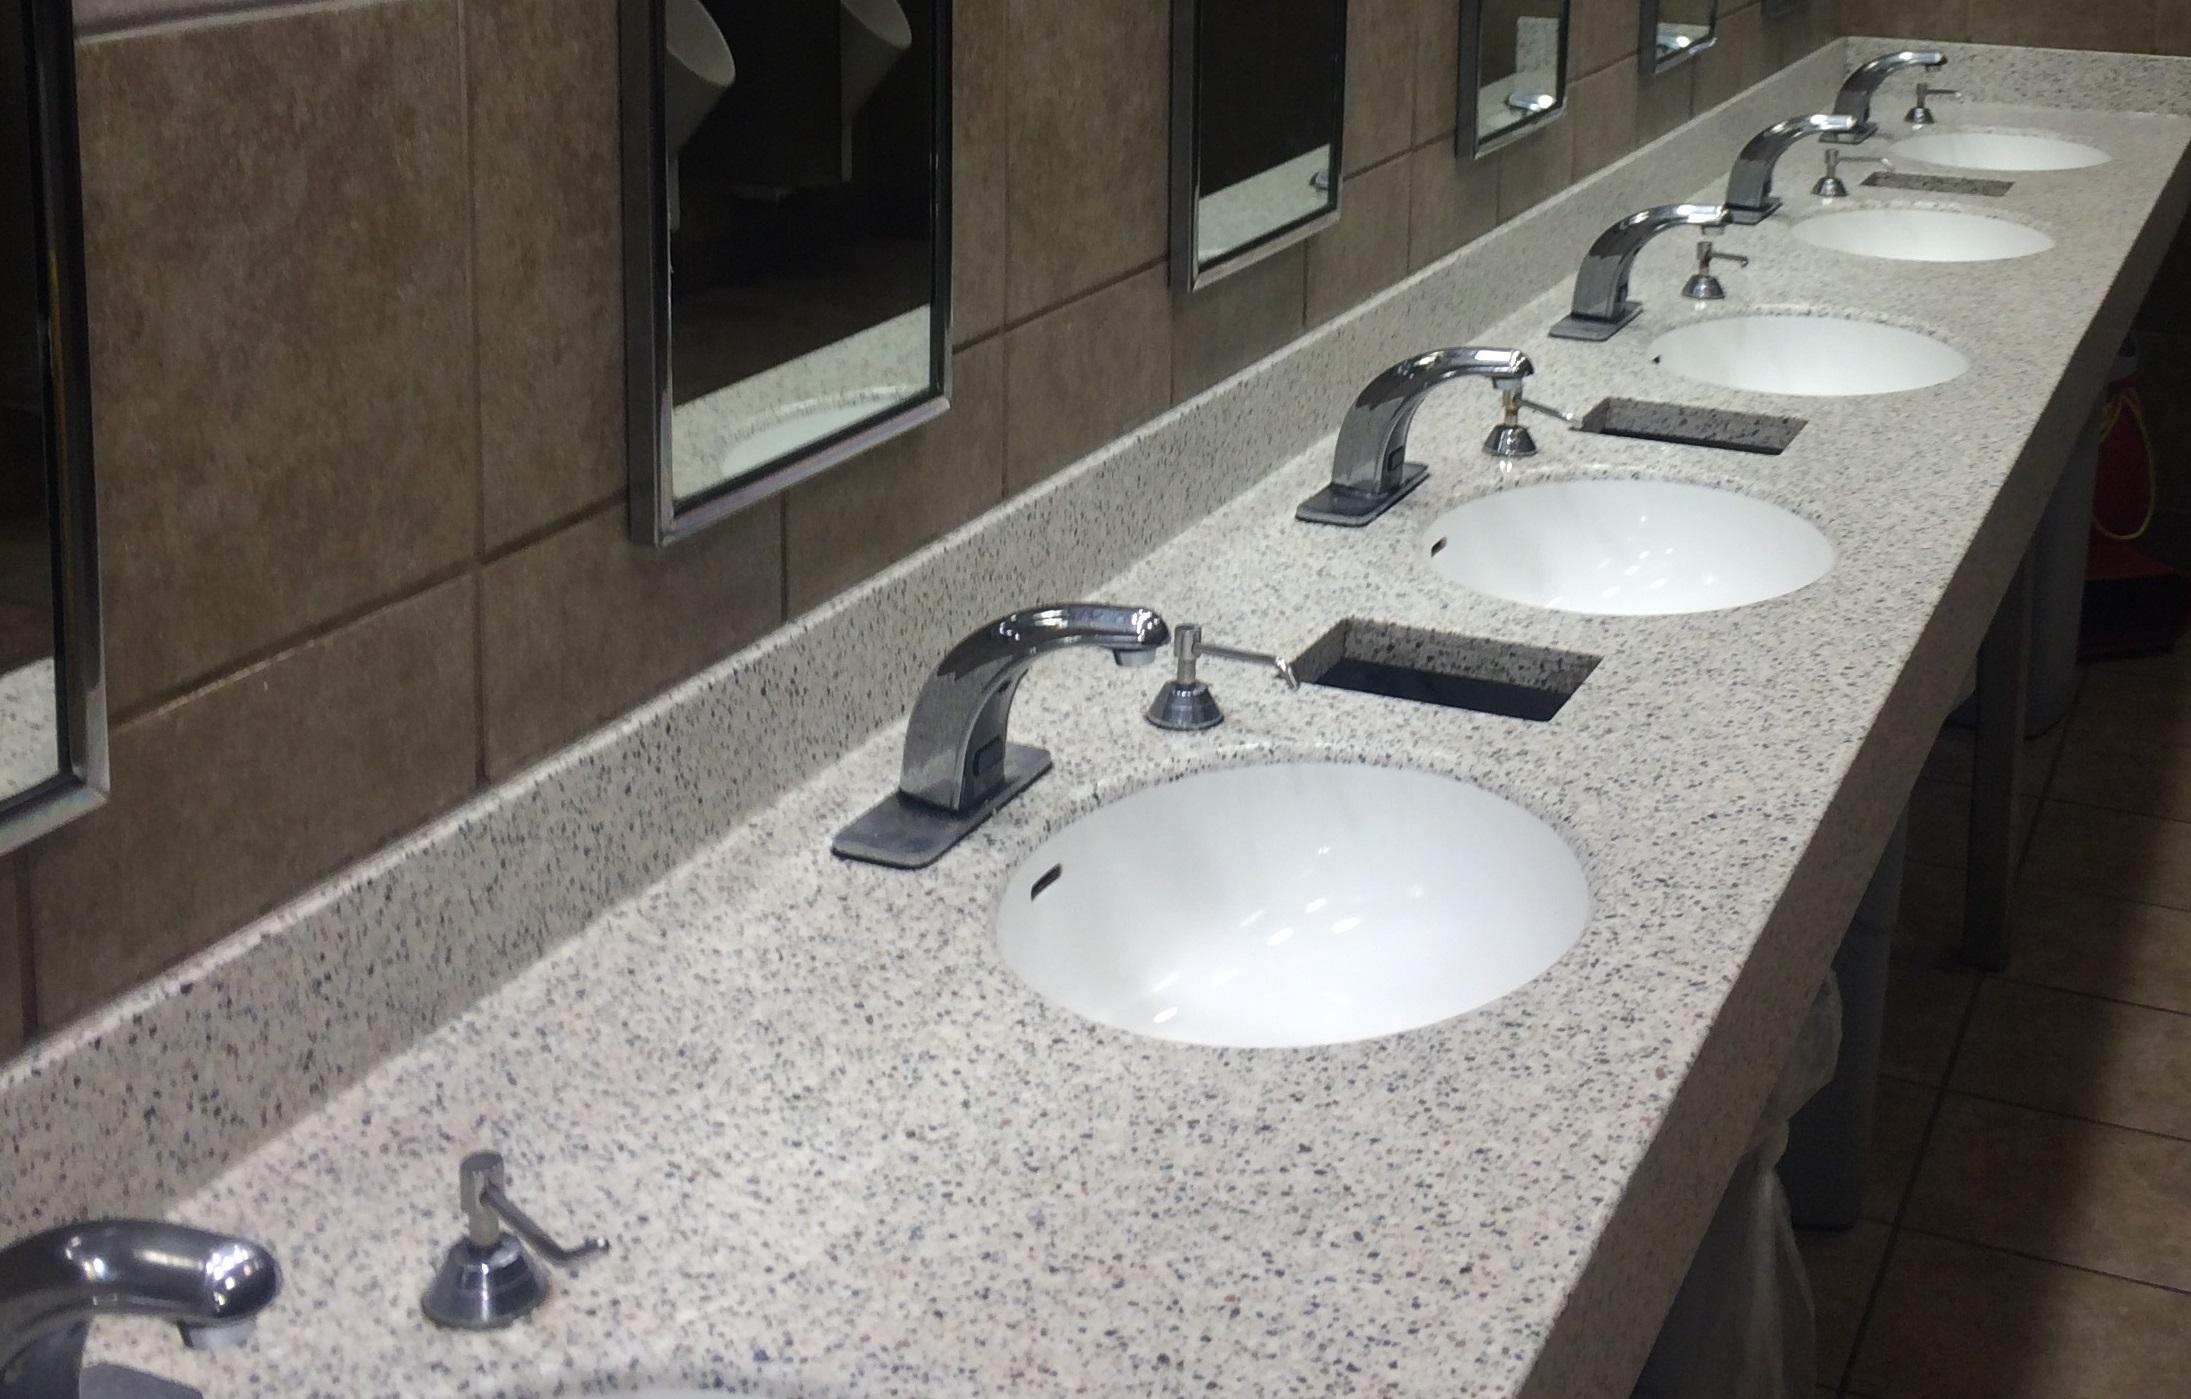 tremendous commercial bathroom vanity sinks units suppliers vanities washroom lights tops grade stainless height offers. Blue Bathroom Tile 3 Commercial Bathroom Countertops Termabell